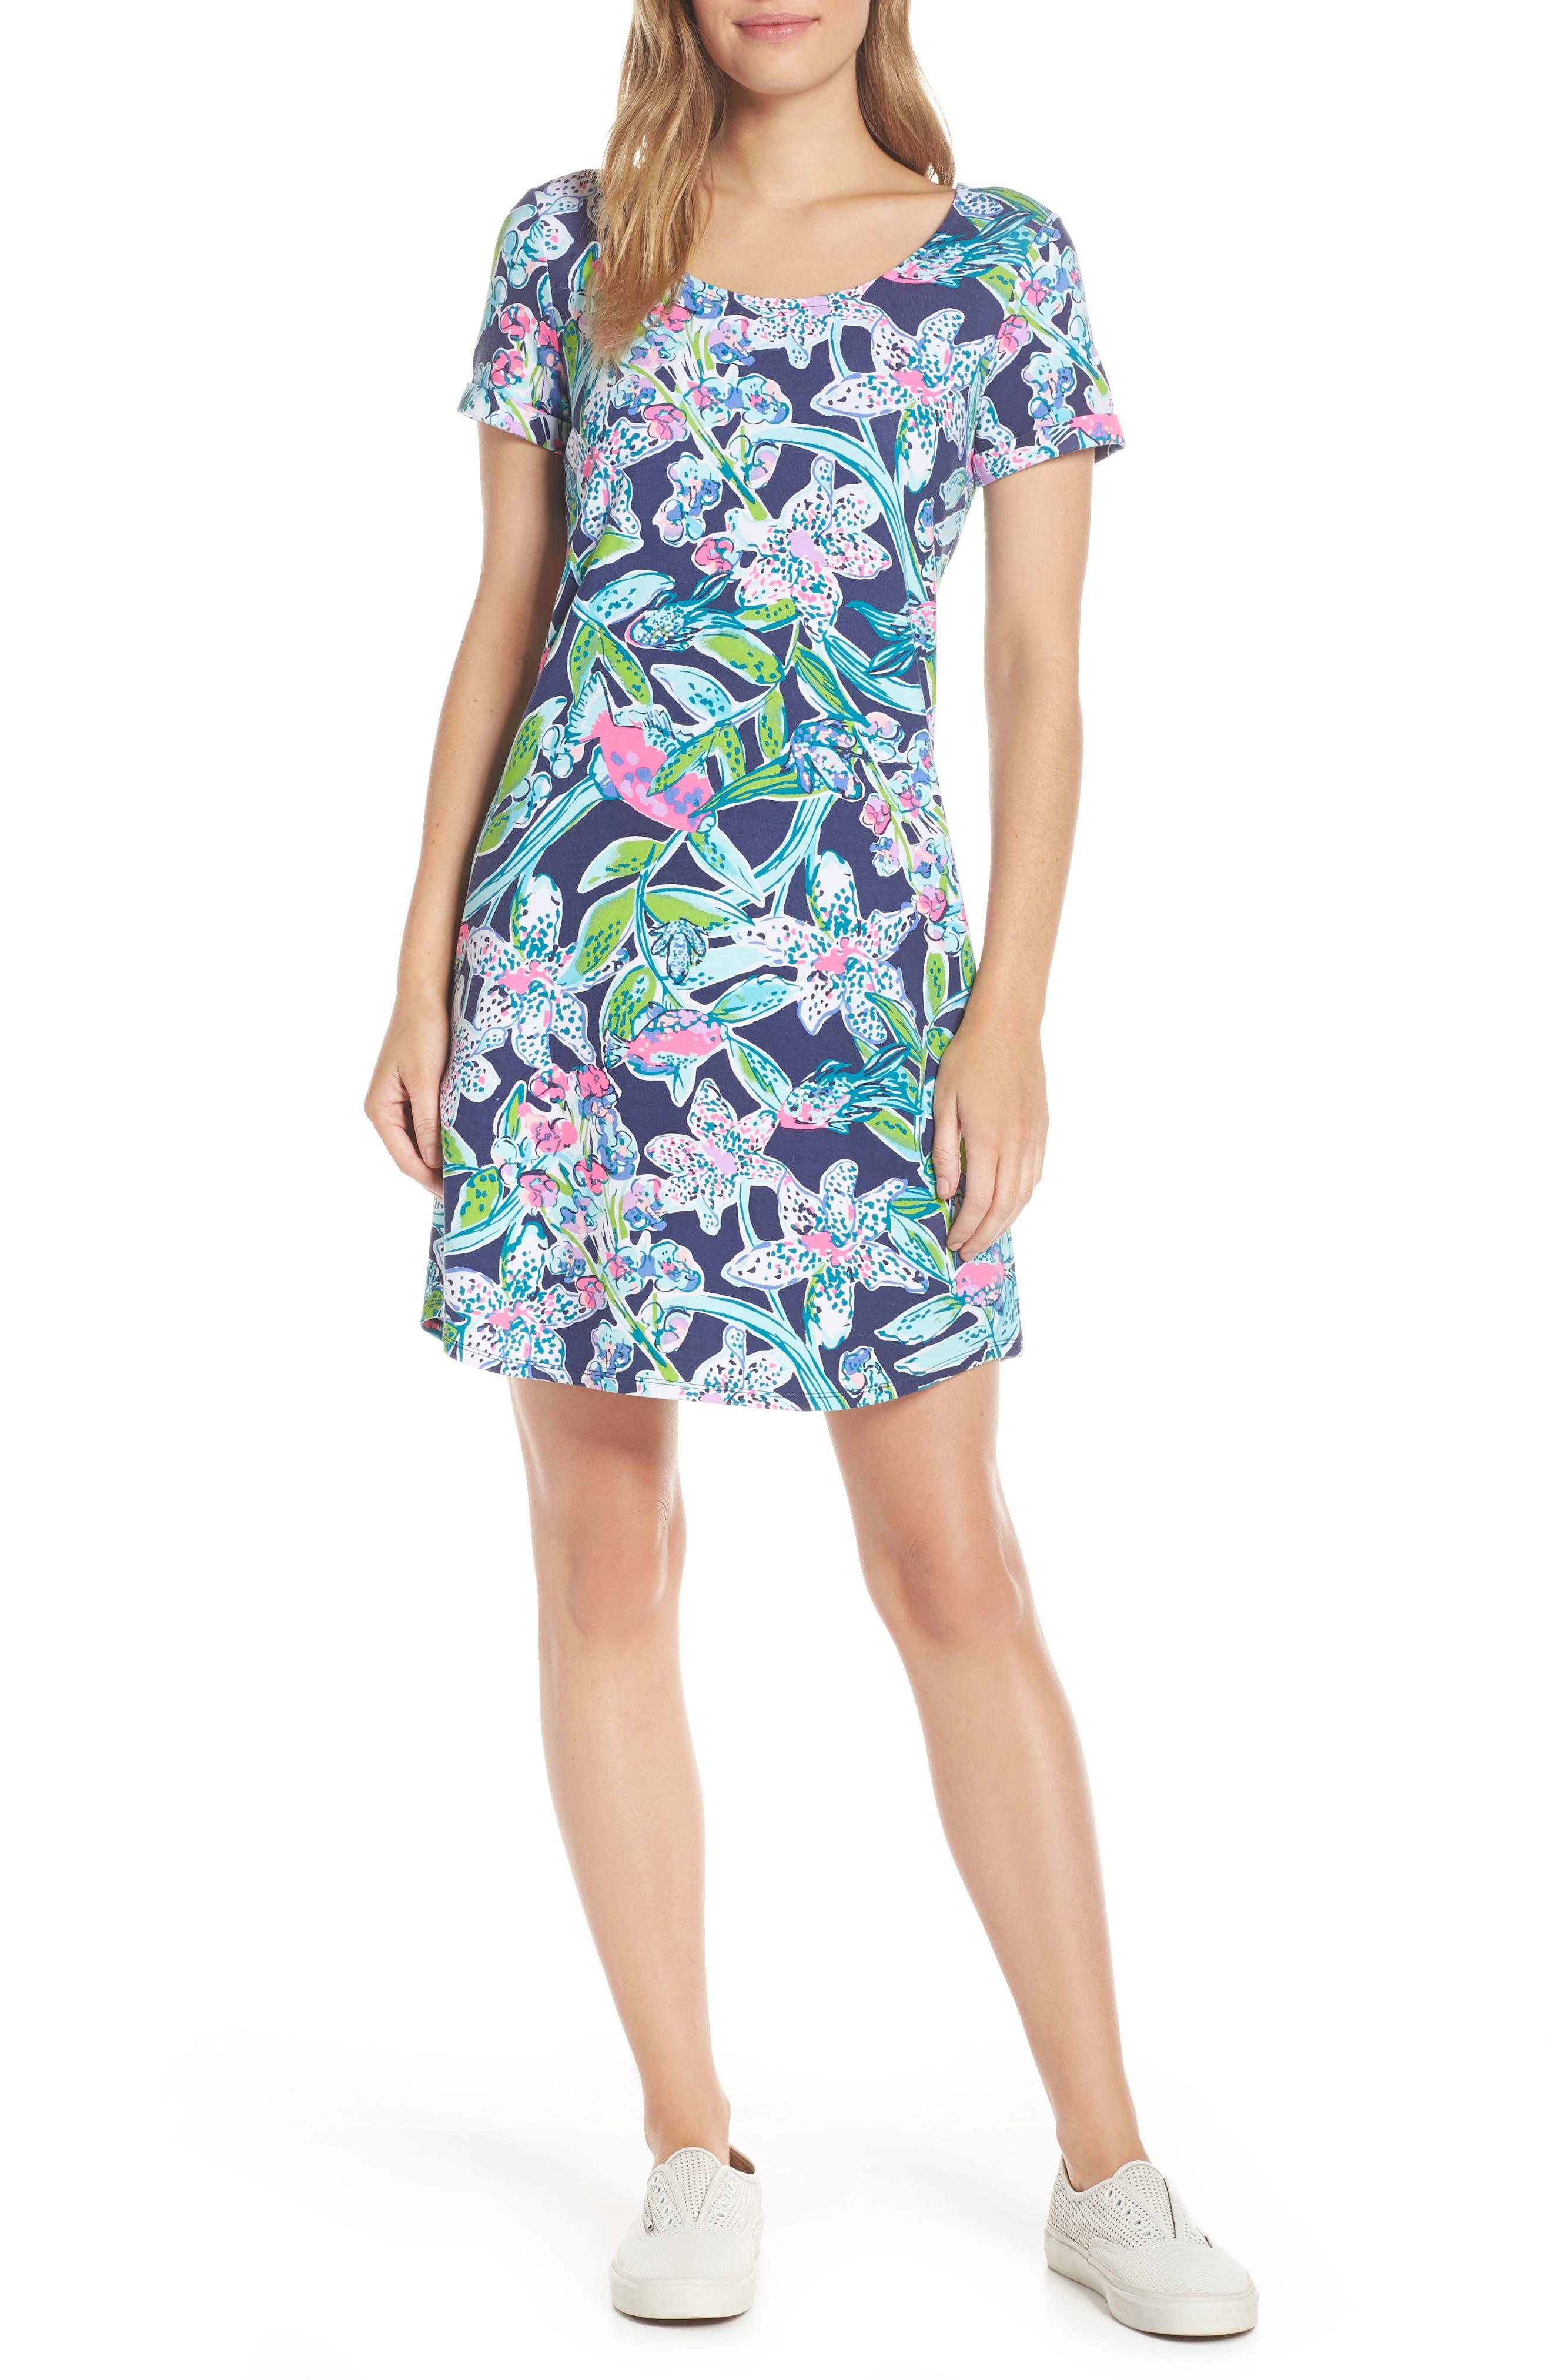 Lilly Pulitzer Tammy Floral Upf 50+ Dress, Blue